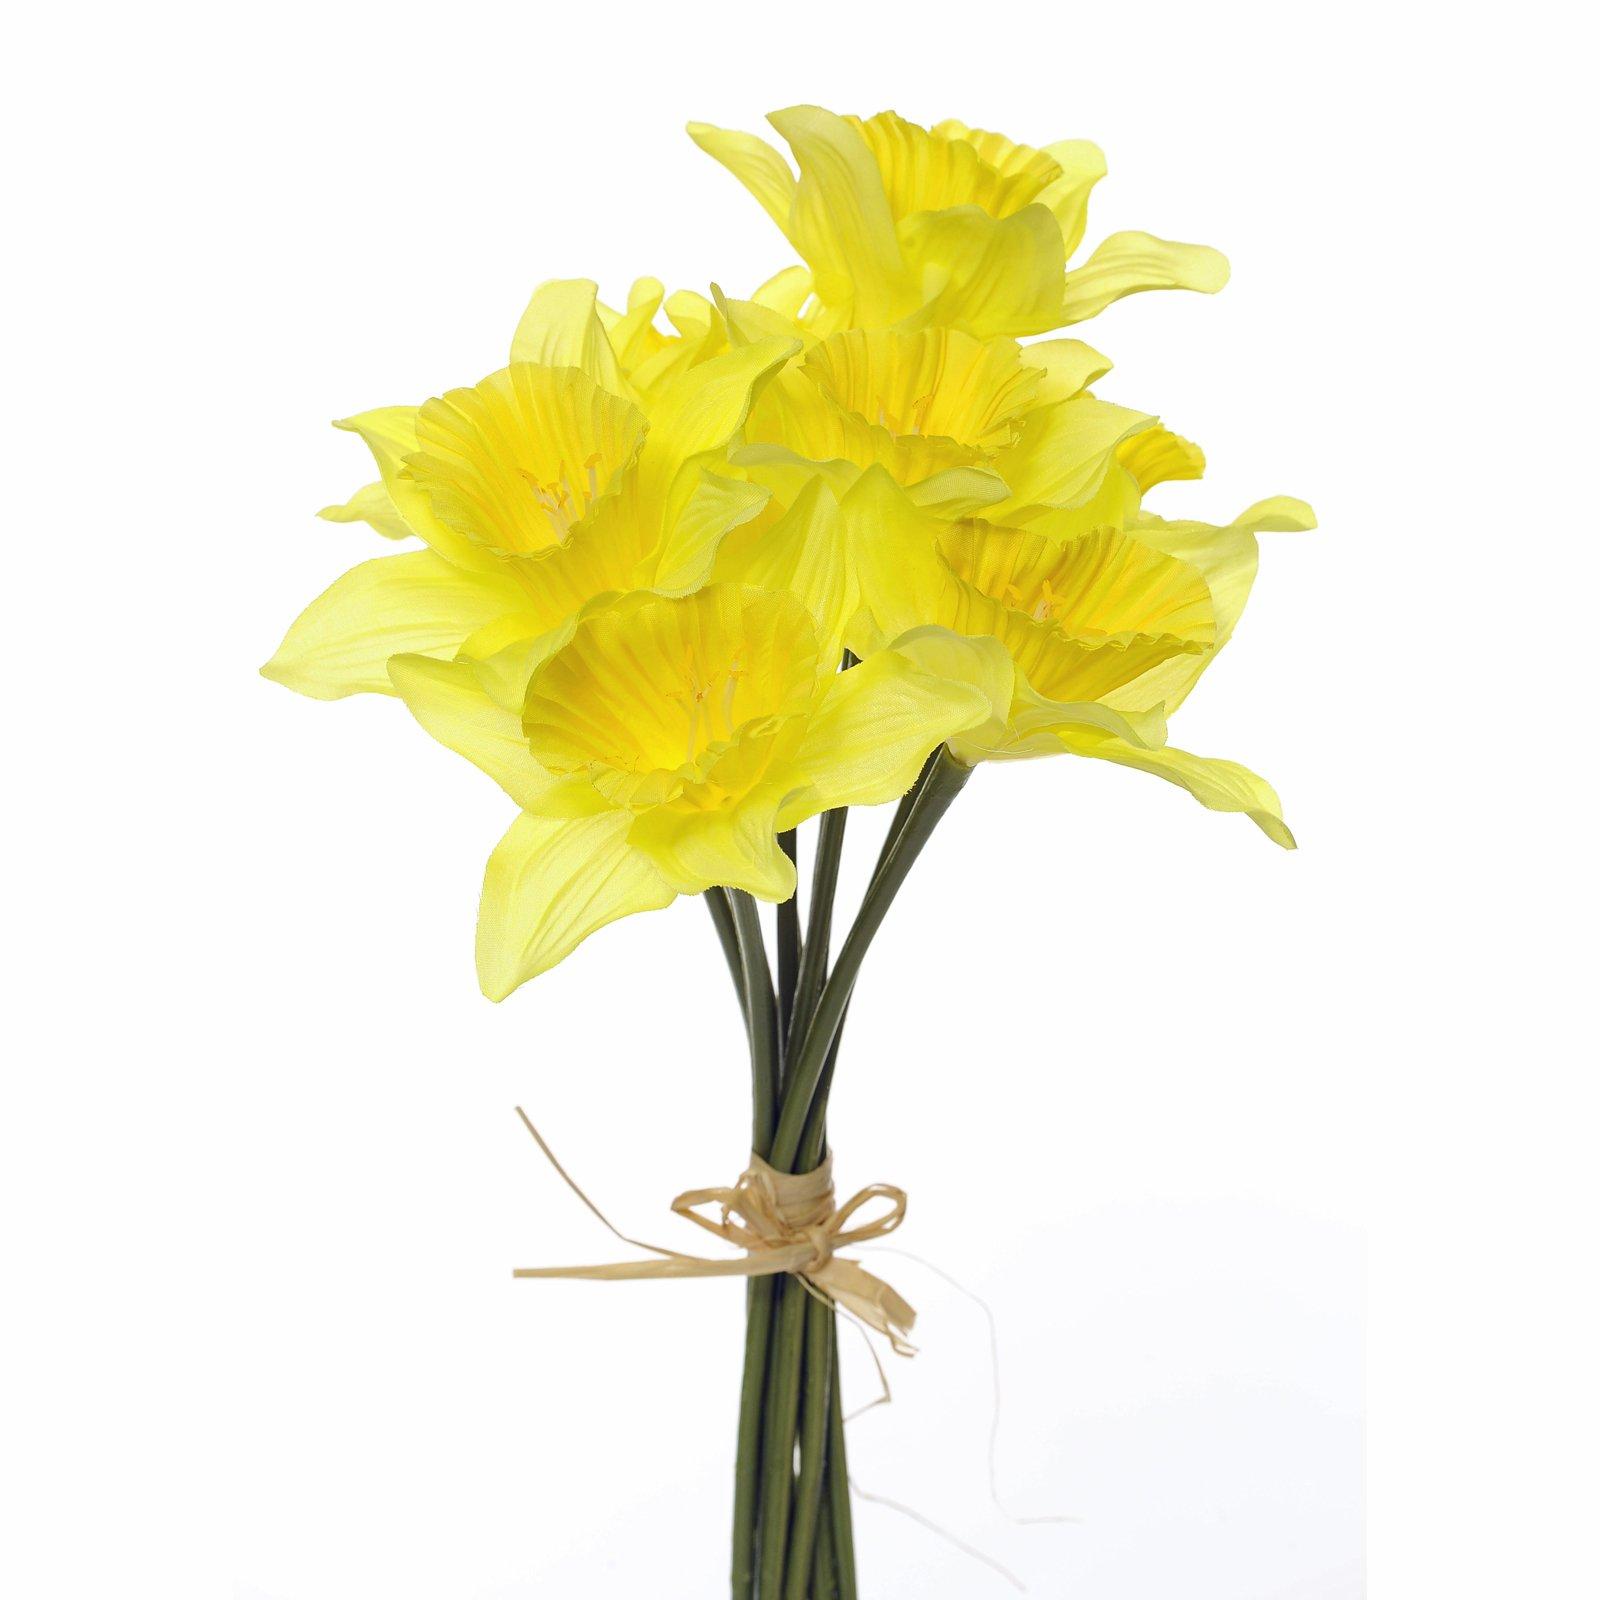 NEW Silk Daffodils Bunch 9 Stems Realistic Yellow Daff 5053882017050 ...